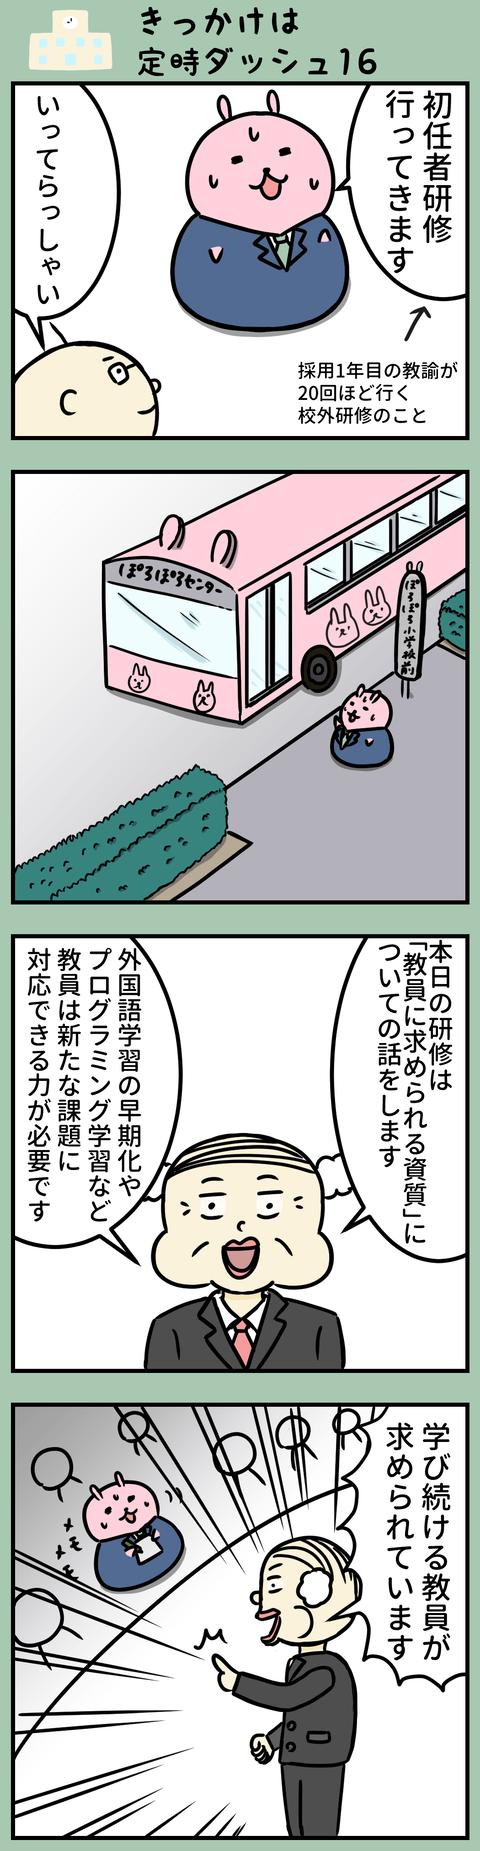 manga-yuzuporo70-1